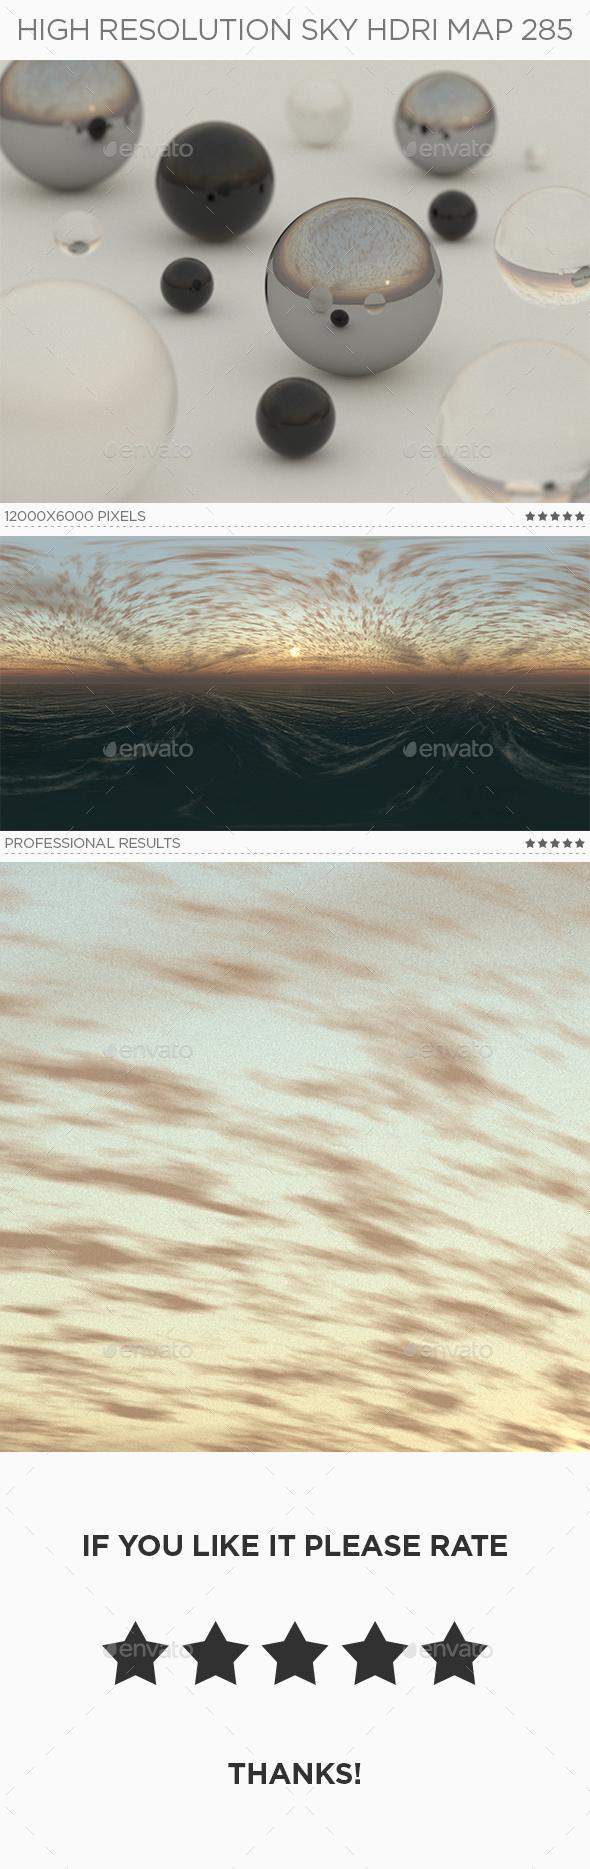 High Resolution Sky HDRi Map 285 - 3DOcean Item for Sale